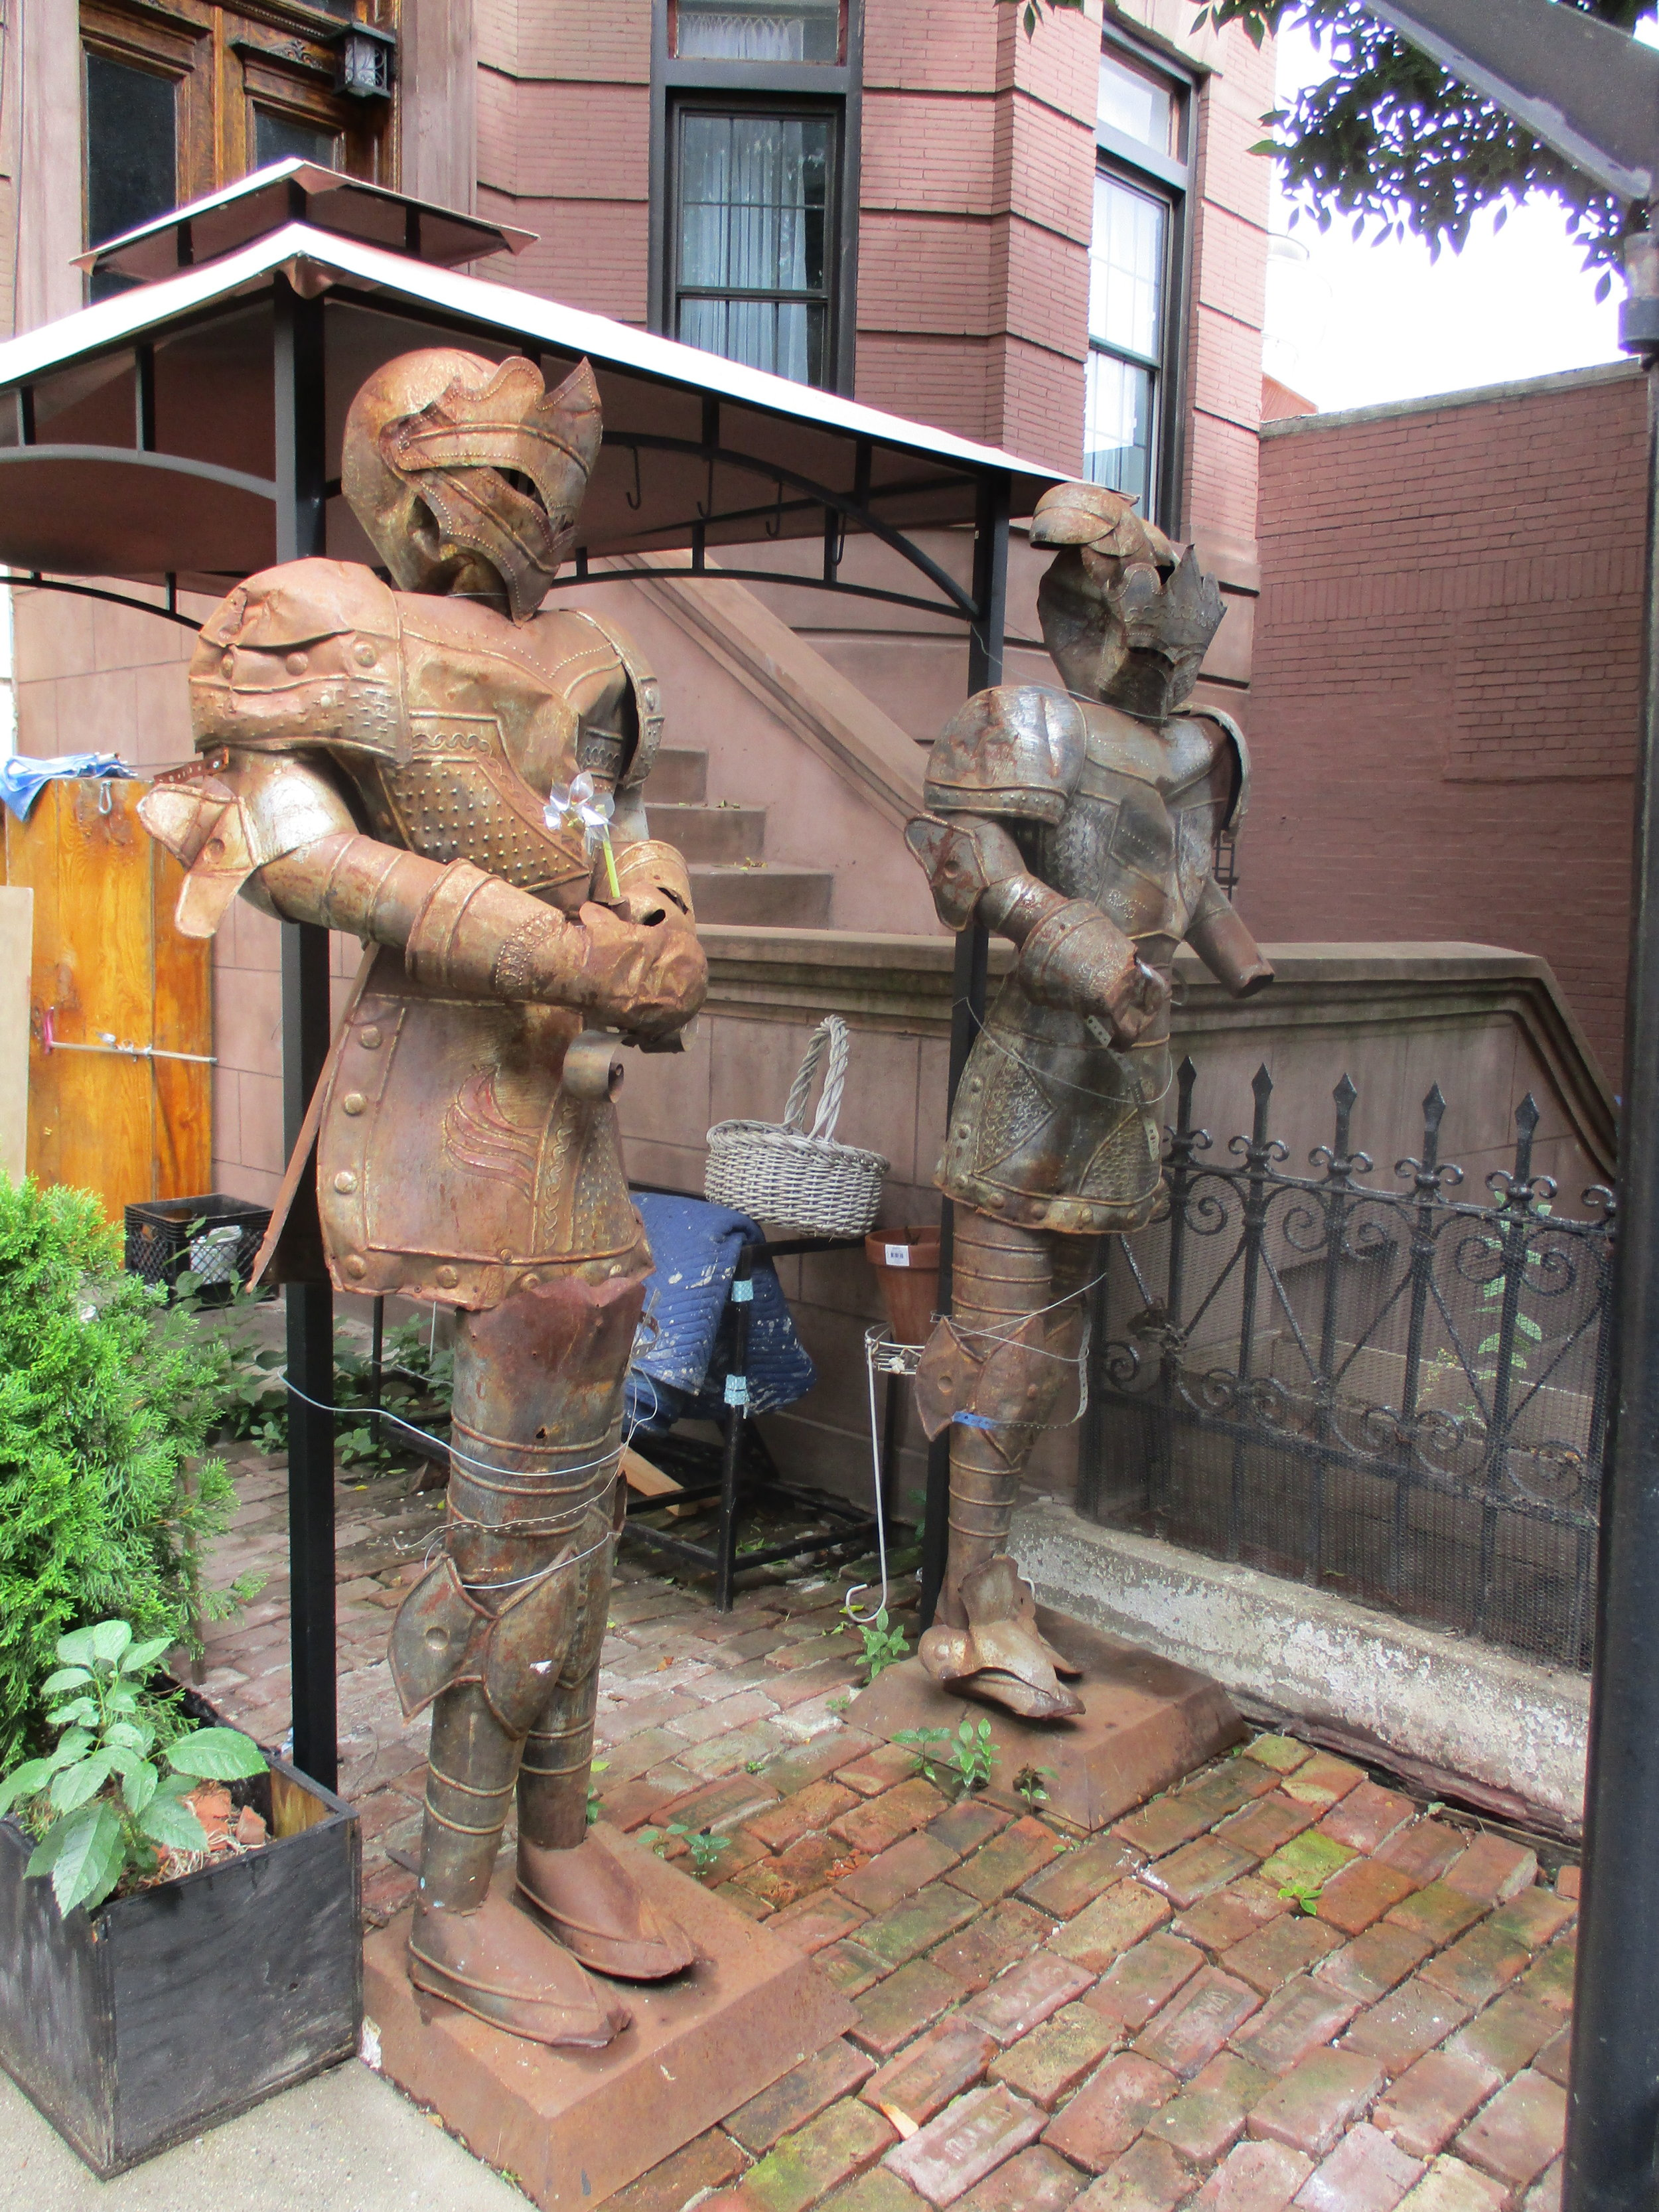 Two knights guarding a real estate establishment